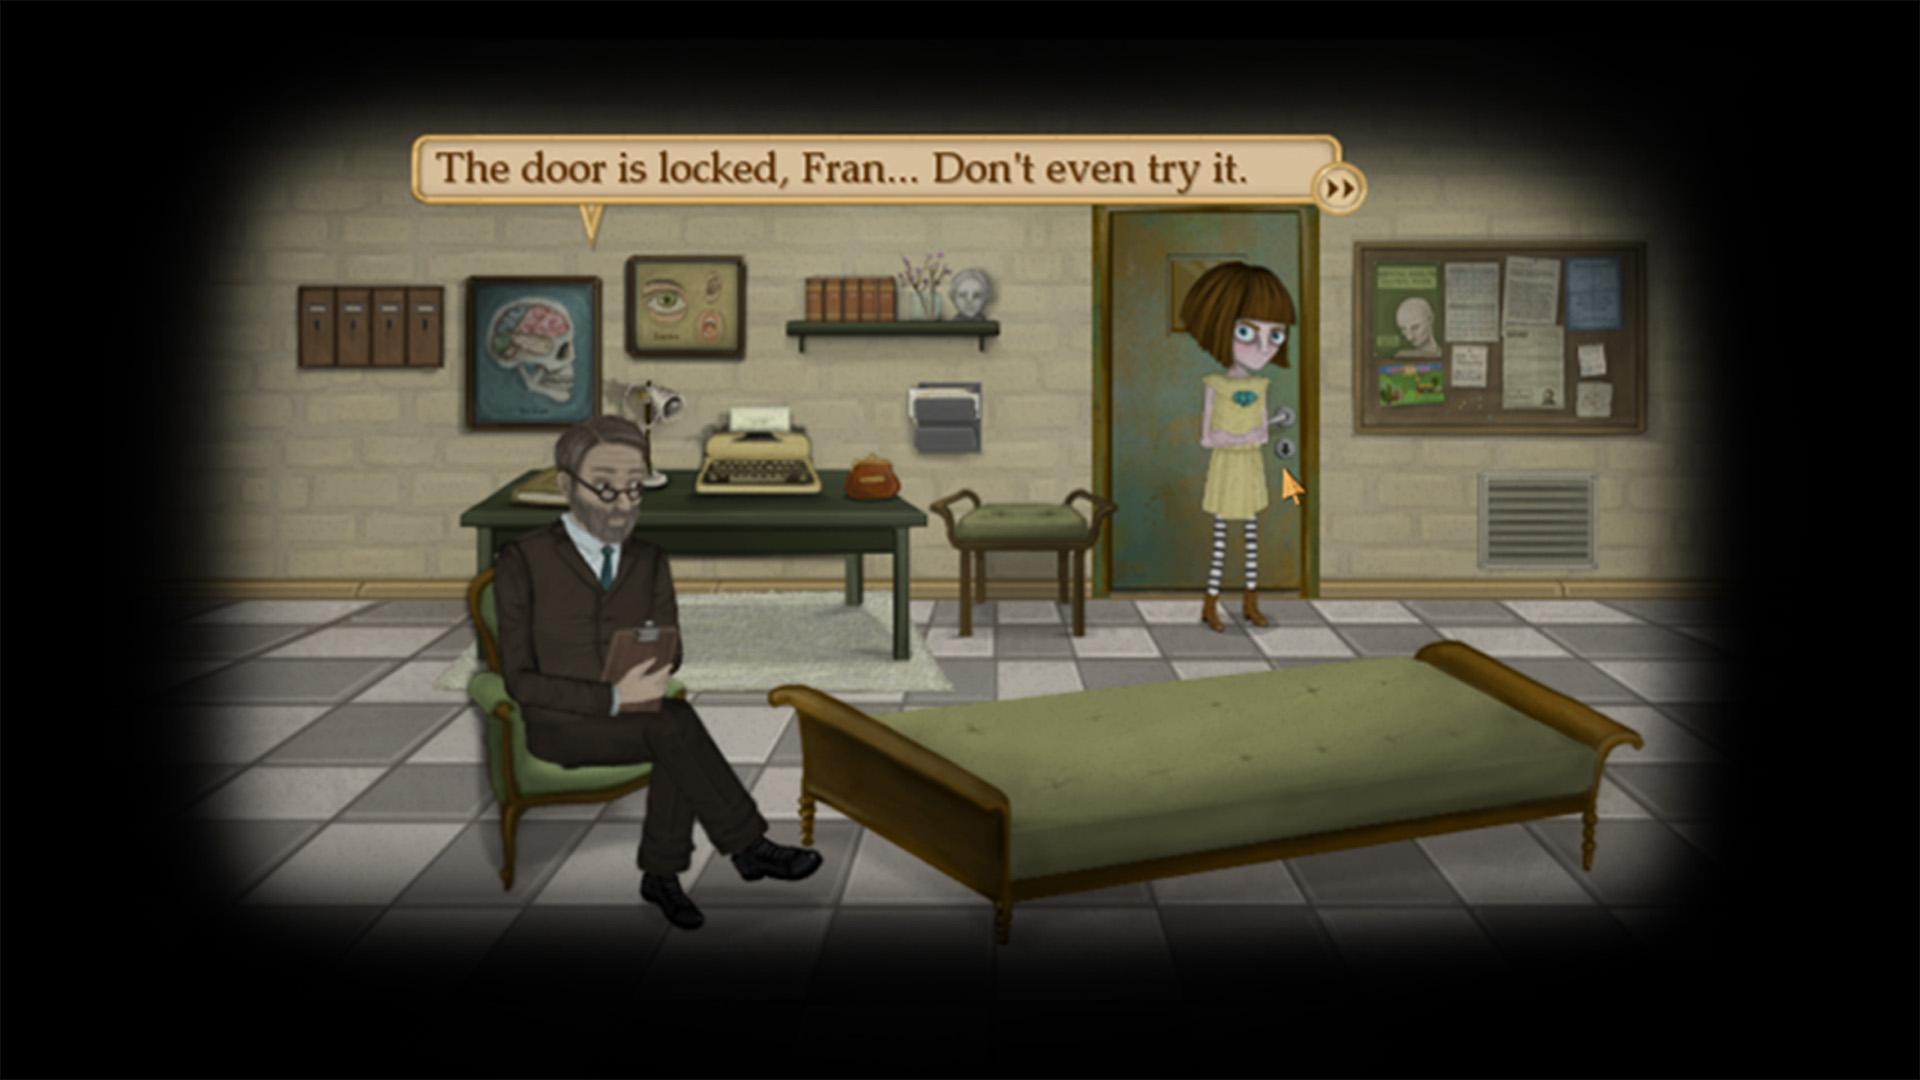 Fran Bow best psychological thriller games for Android